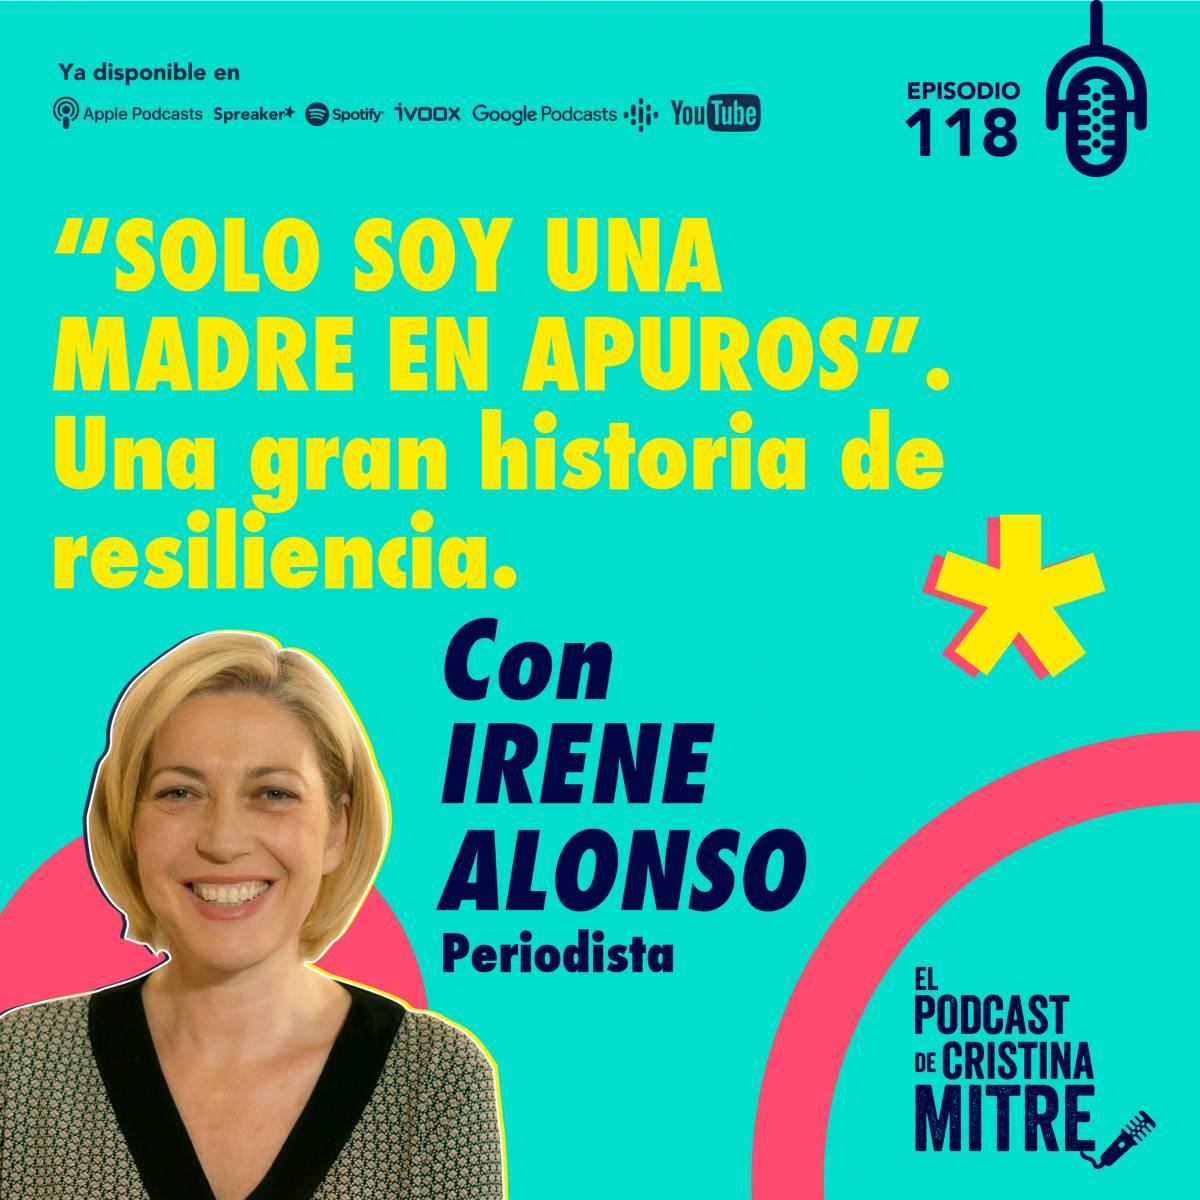 Irene Alonso